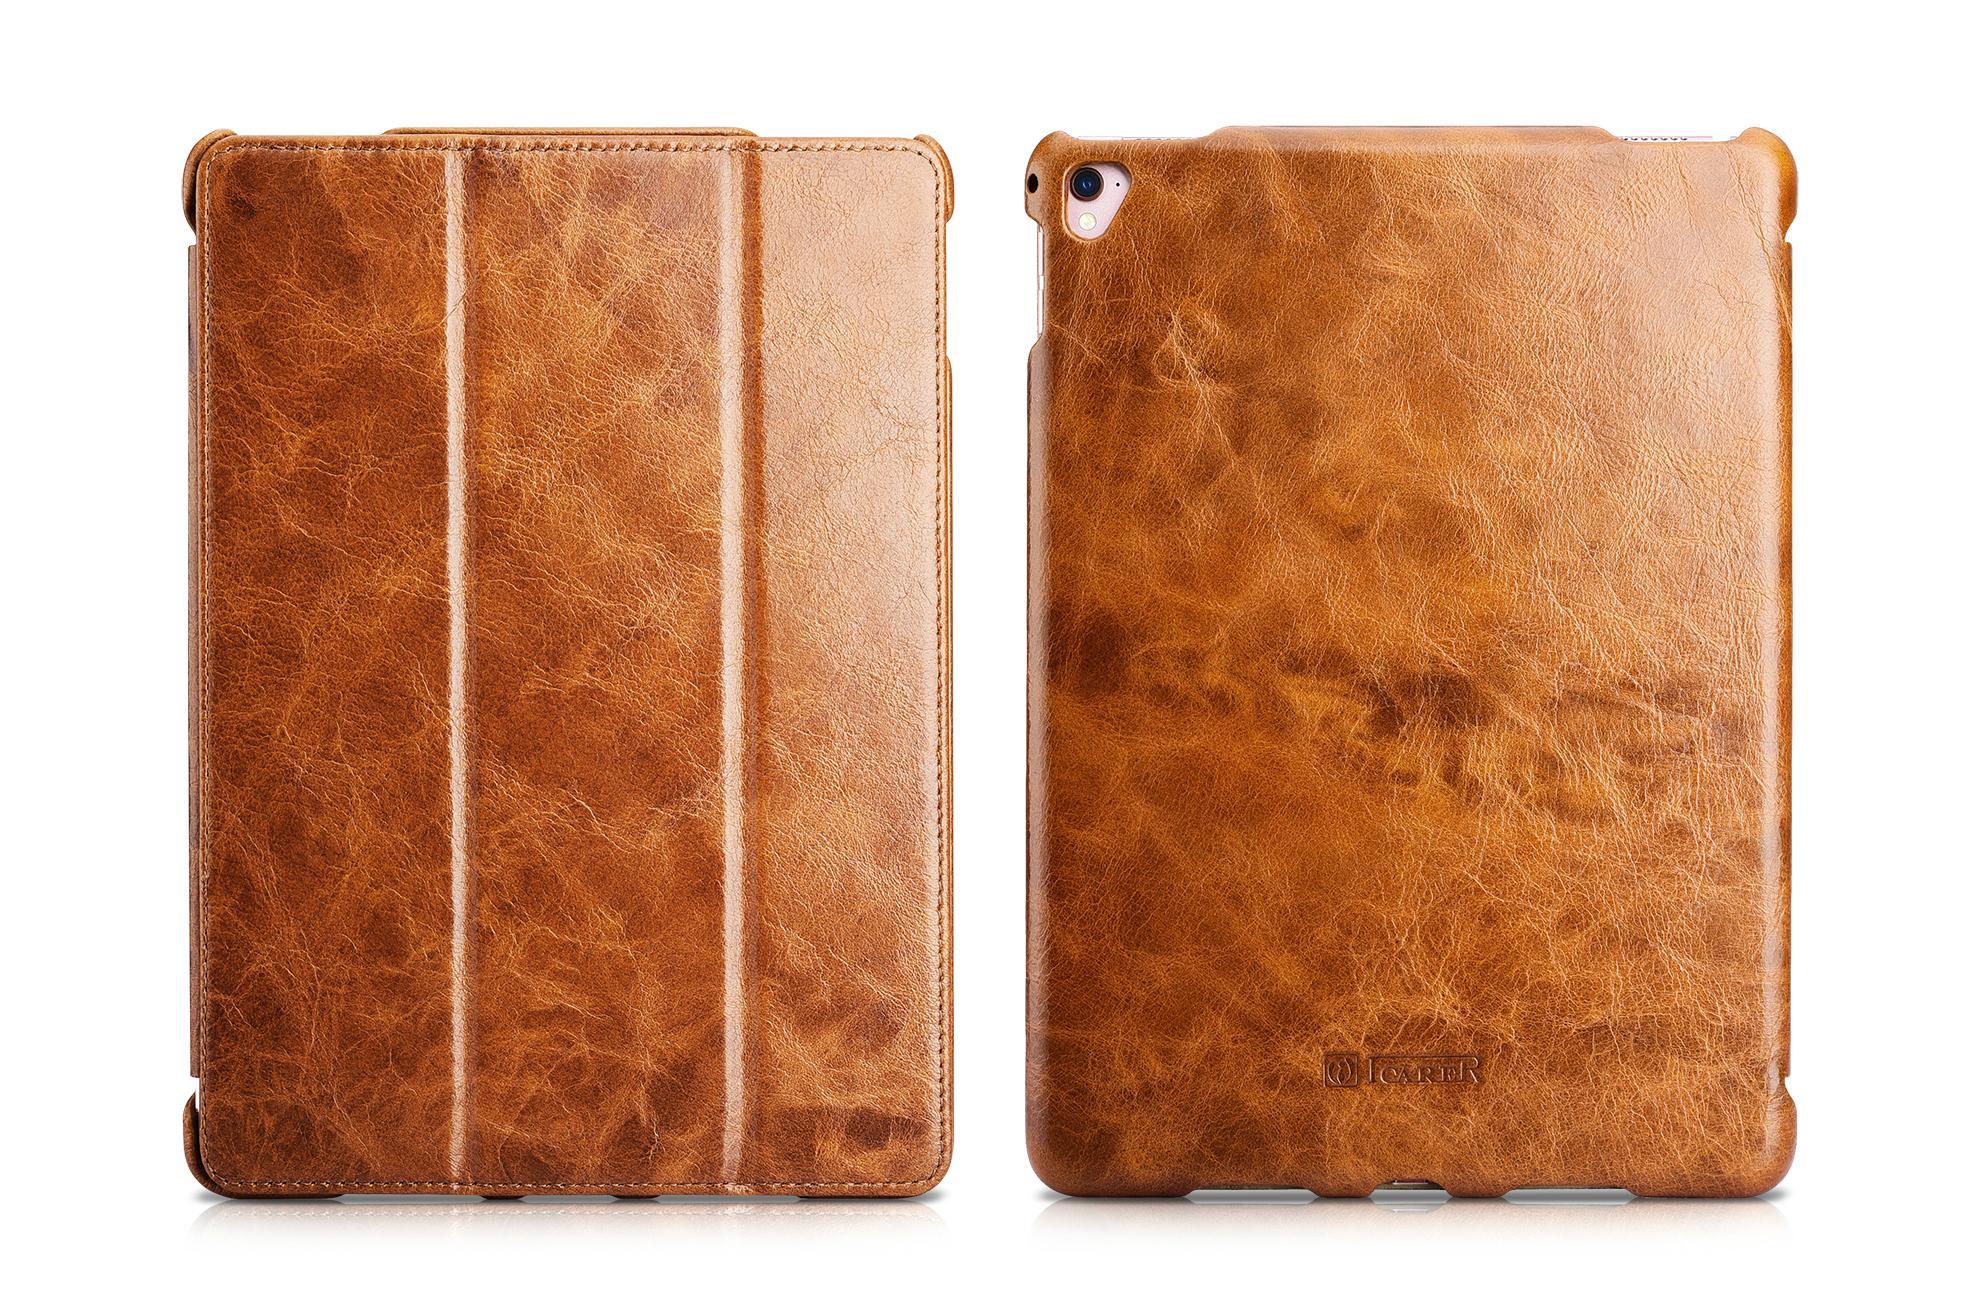 iCarer iPad Pro 9.7 inch Oil Wax Vintage Genuine Leather Folio Case 3